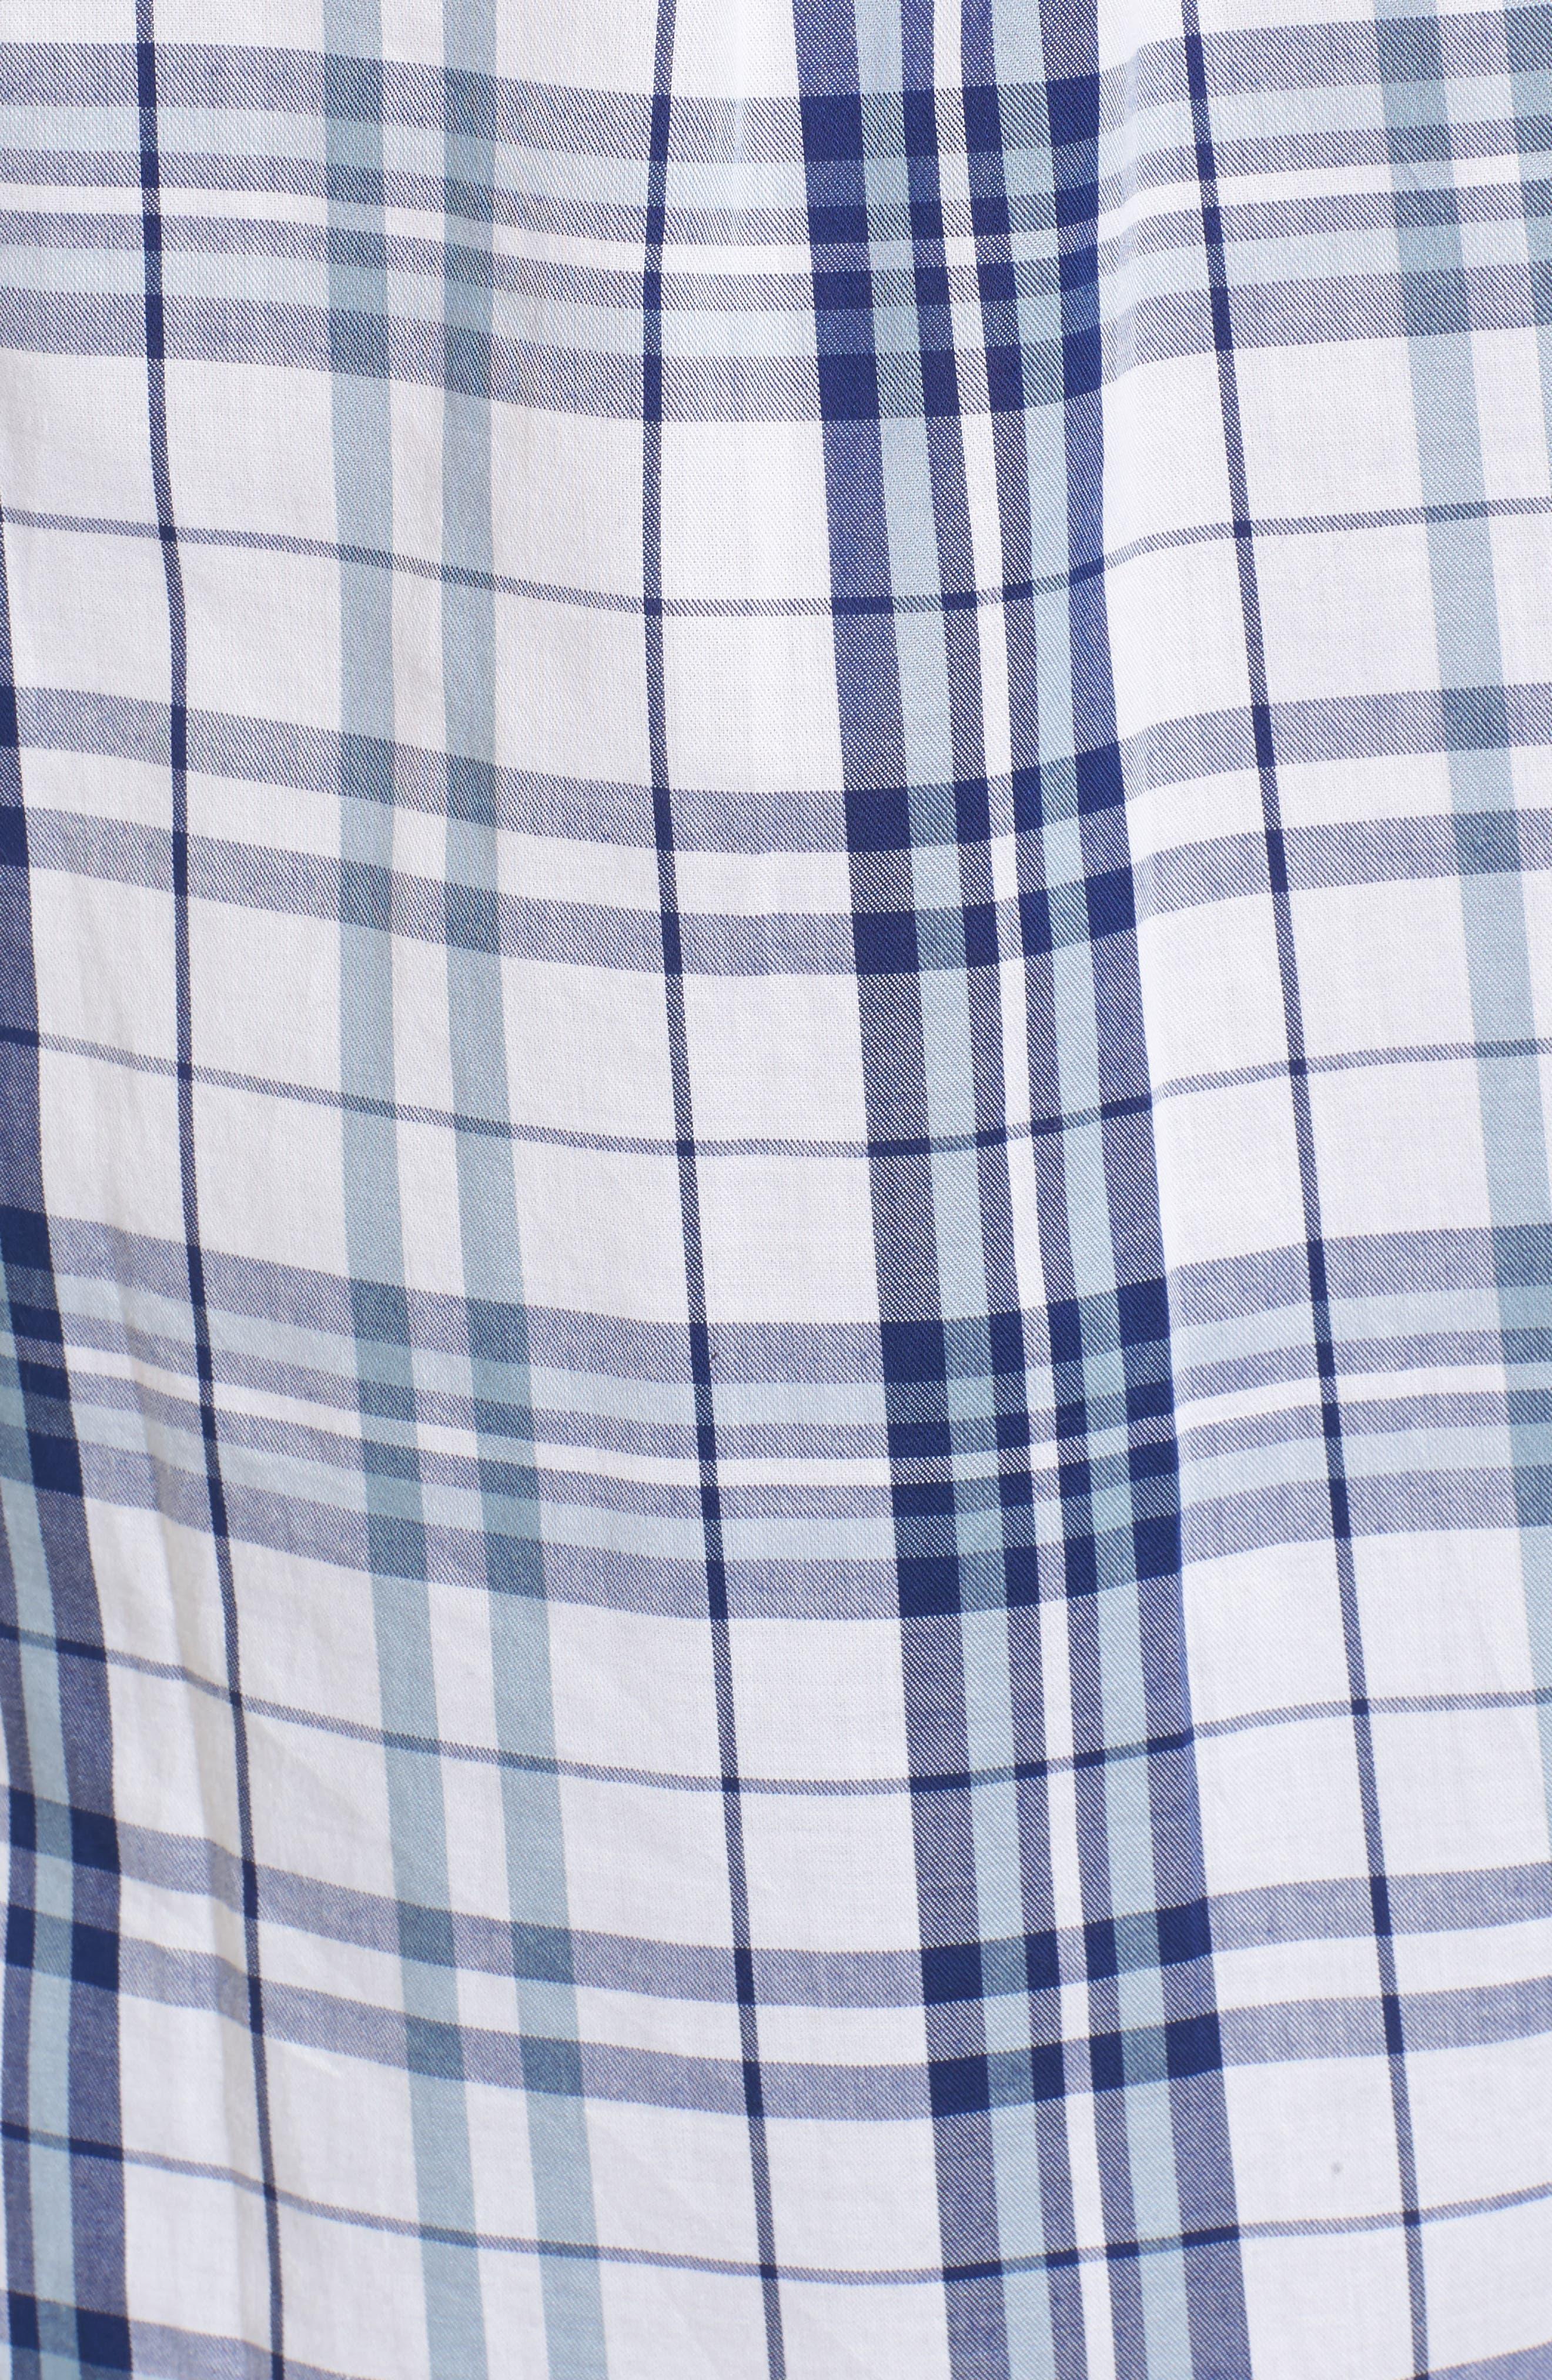 Selsey Plaid Shirt,                             Alternate thumbnail 5, color,                             White/ Coastal Blue